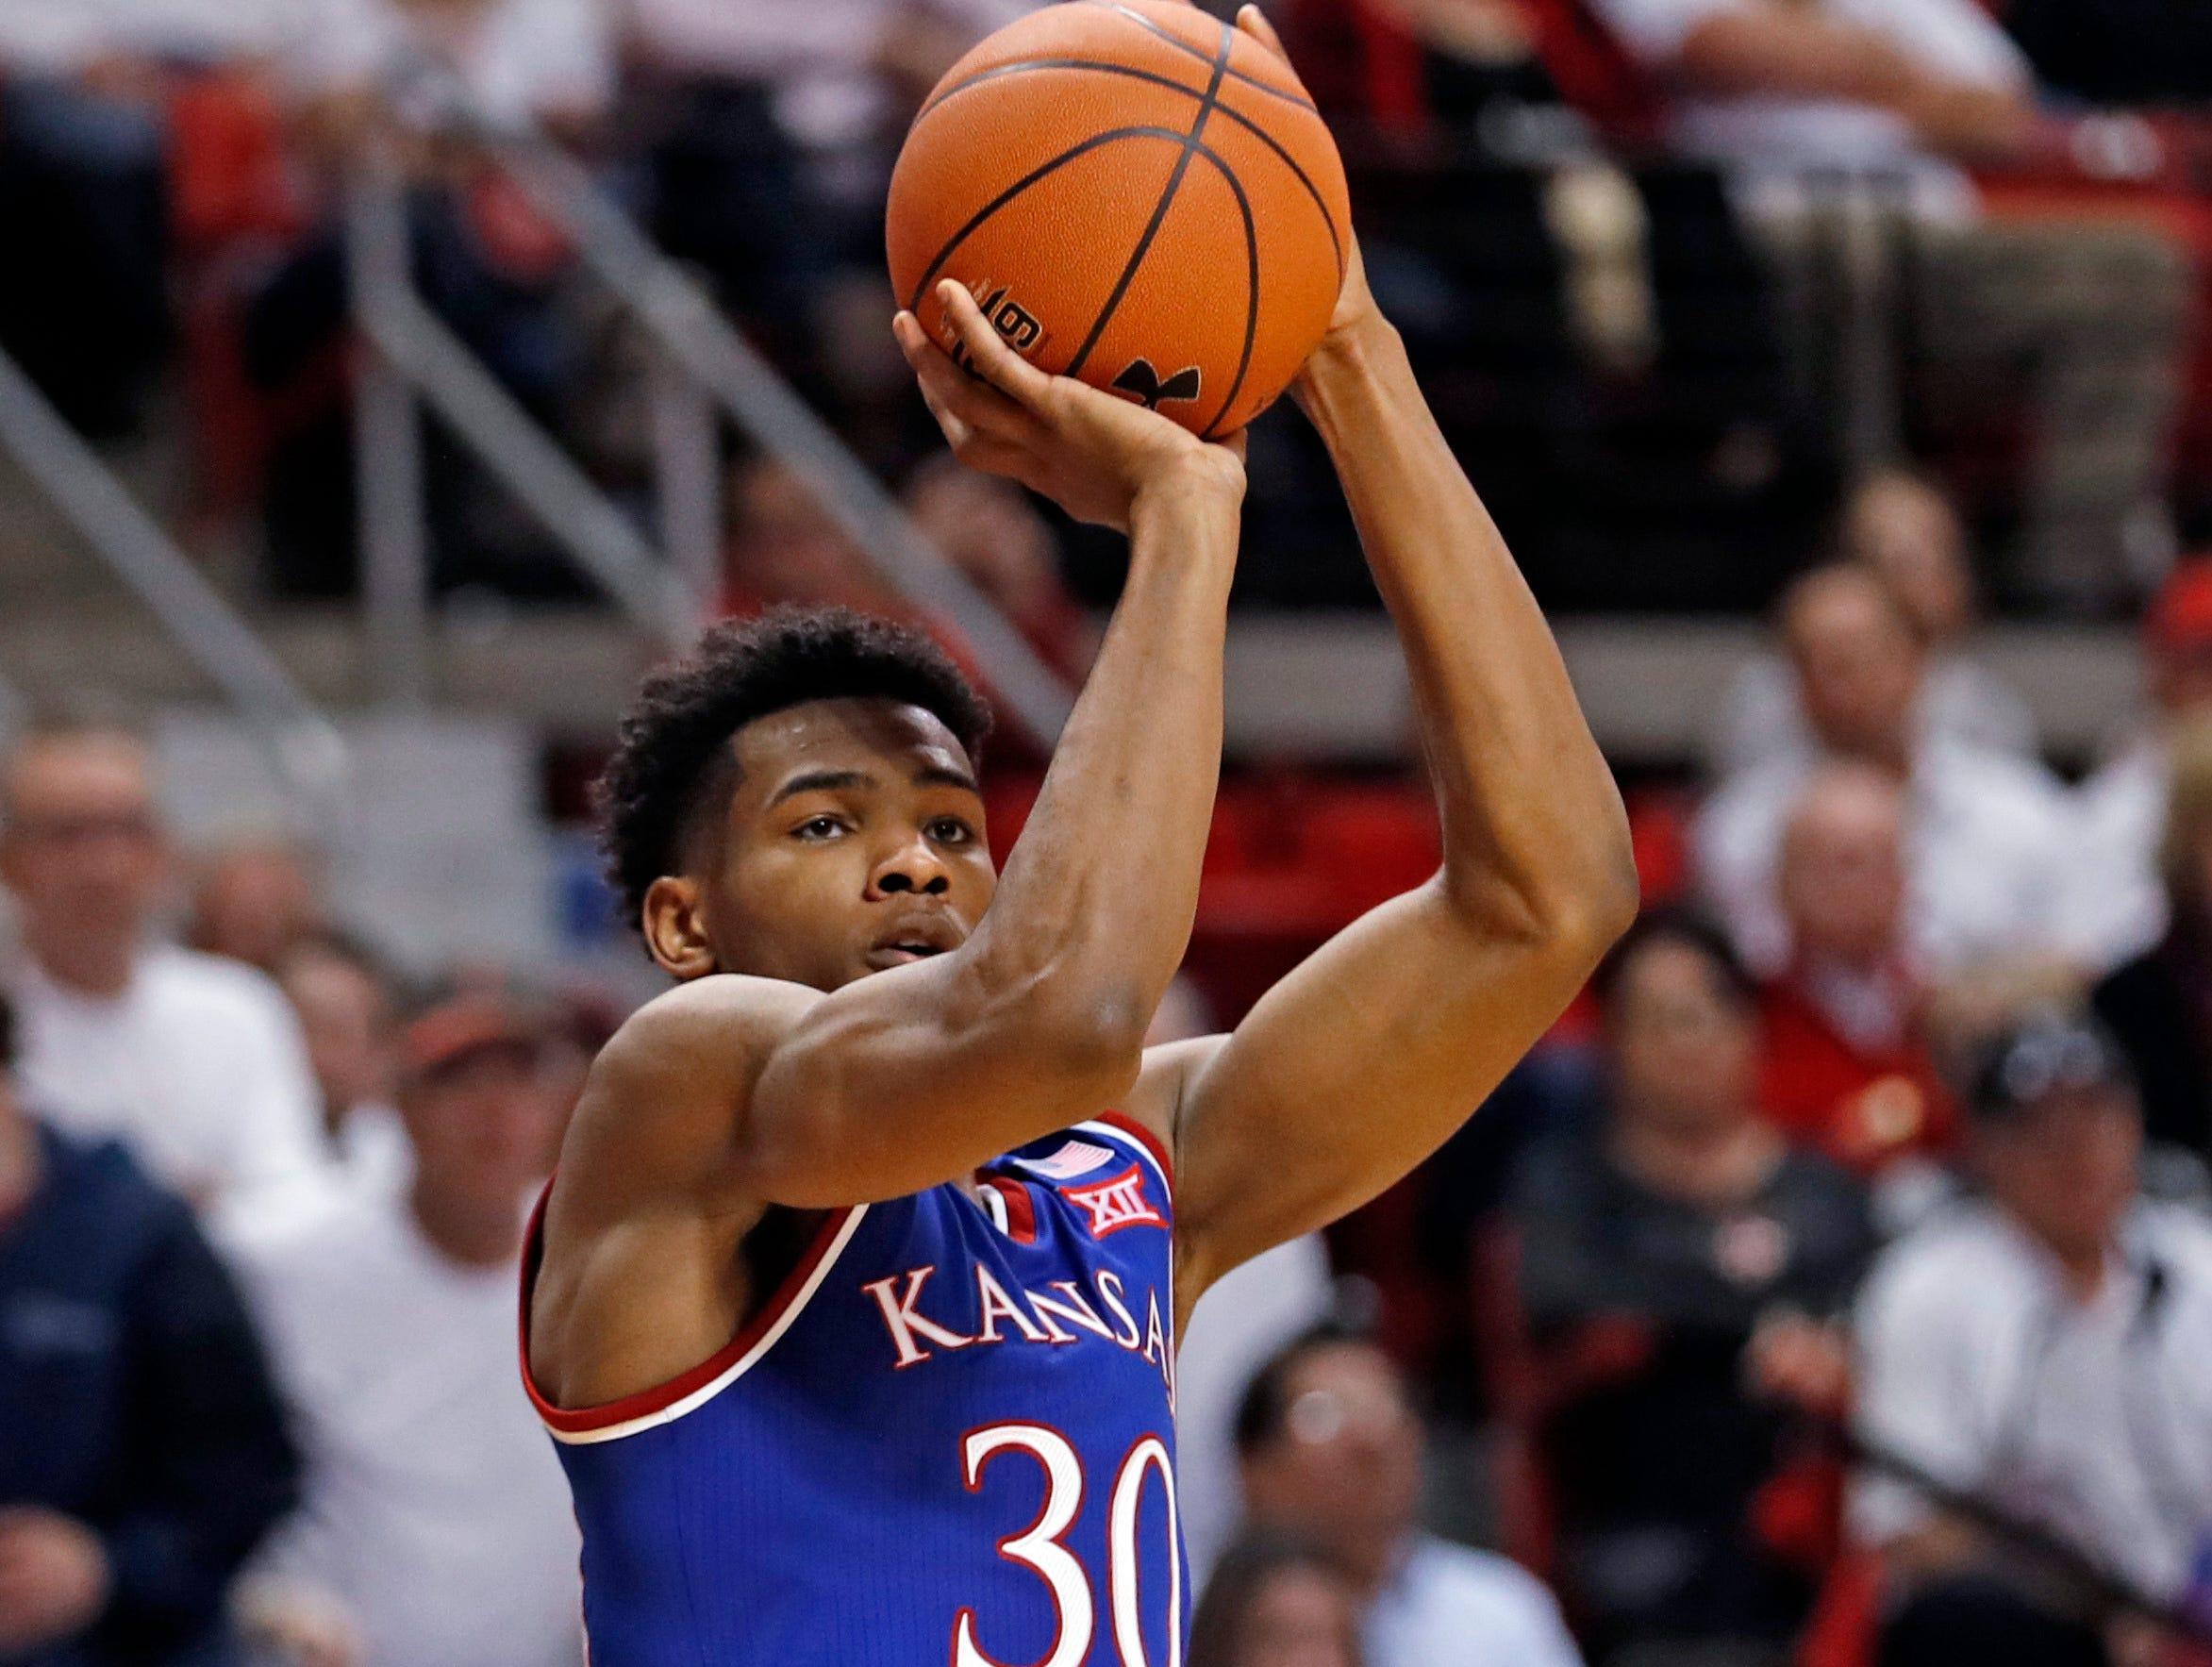 Kansas' Ochai Agbaji (30) shoots during the second half of the team's NCAA college basketball game against Texas Tech, Saturday, Feb. 23, 2019, in Lubbock, Texas. (AP Photo/Brad Tollefson)